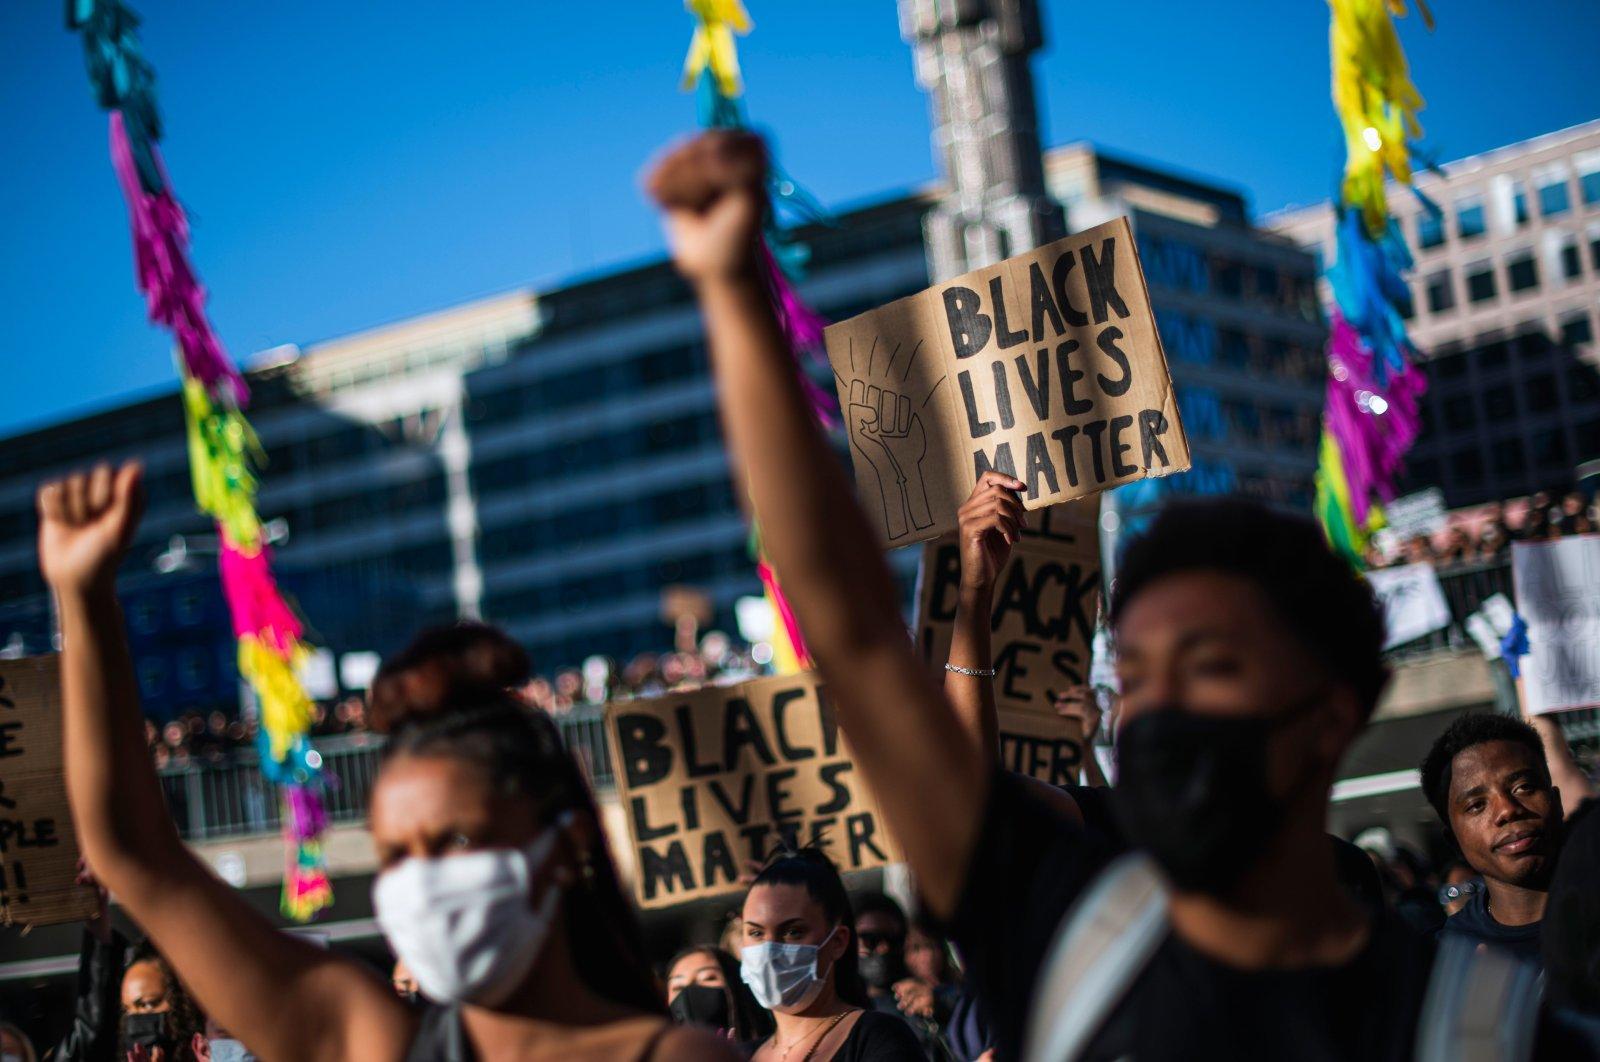 Protesters raise their fists during a Black Lives Matter demonstration in Stockholm, Sweden, June 3, 2020. (AFP)